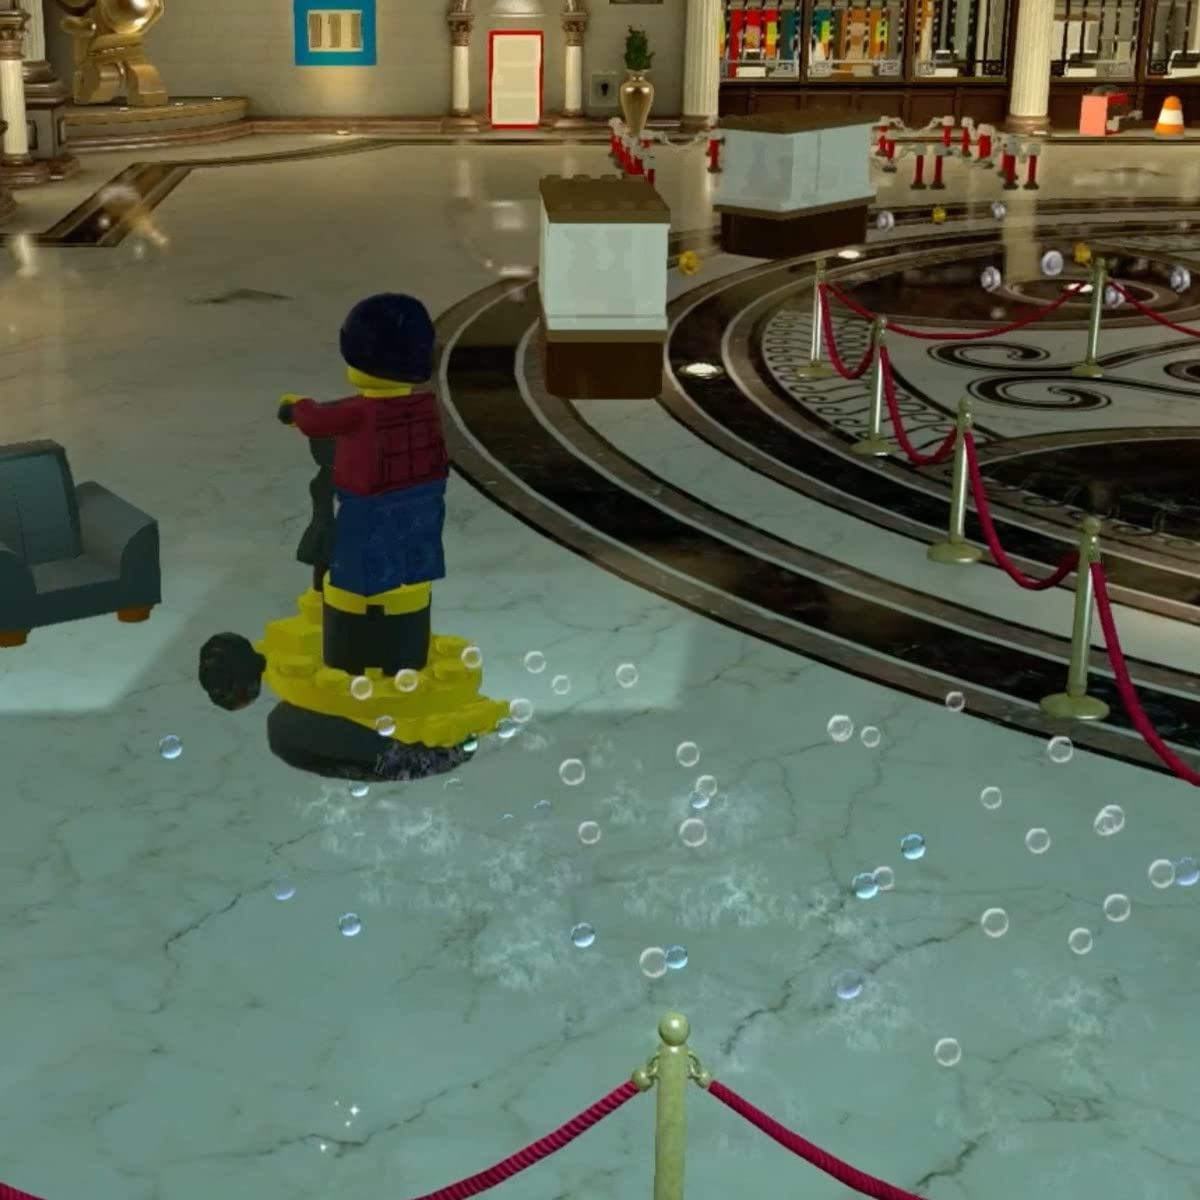 Lego レゴ Ipad壁紙 Robbing A Bank その他 スマホ用画像137363